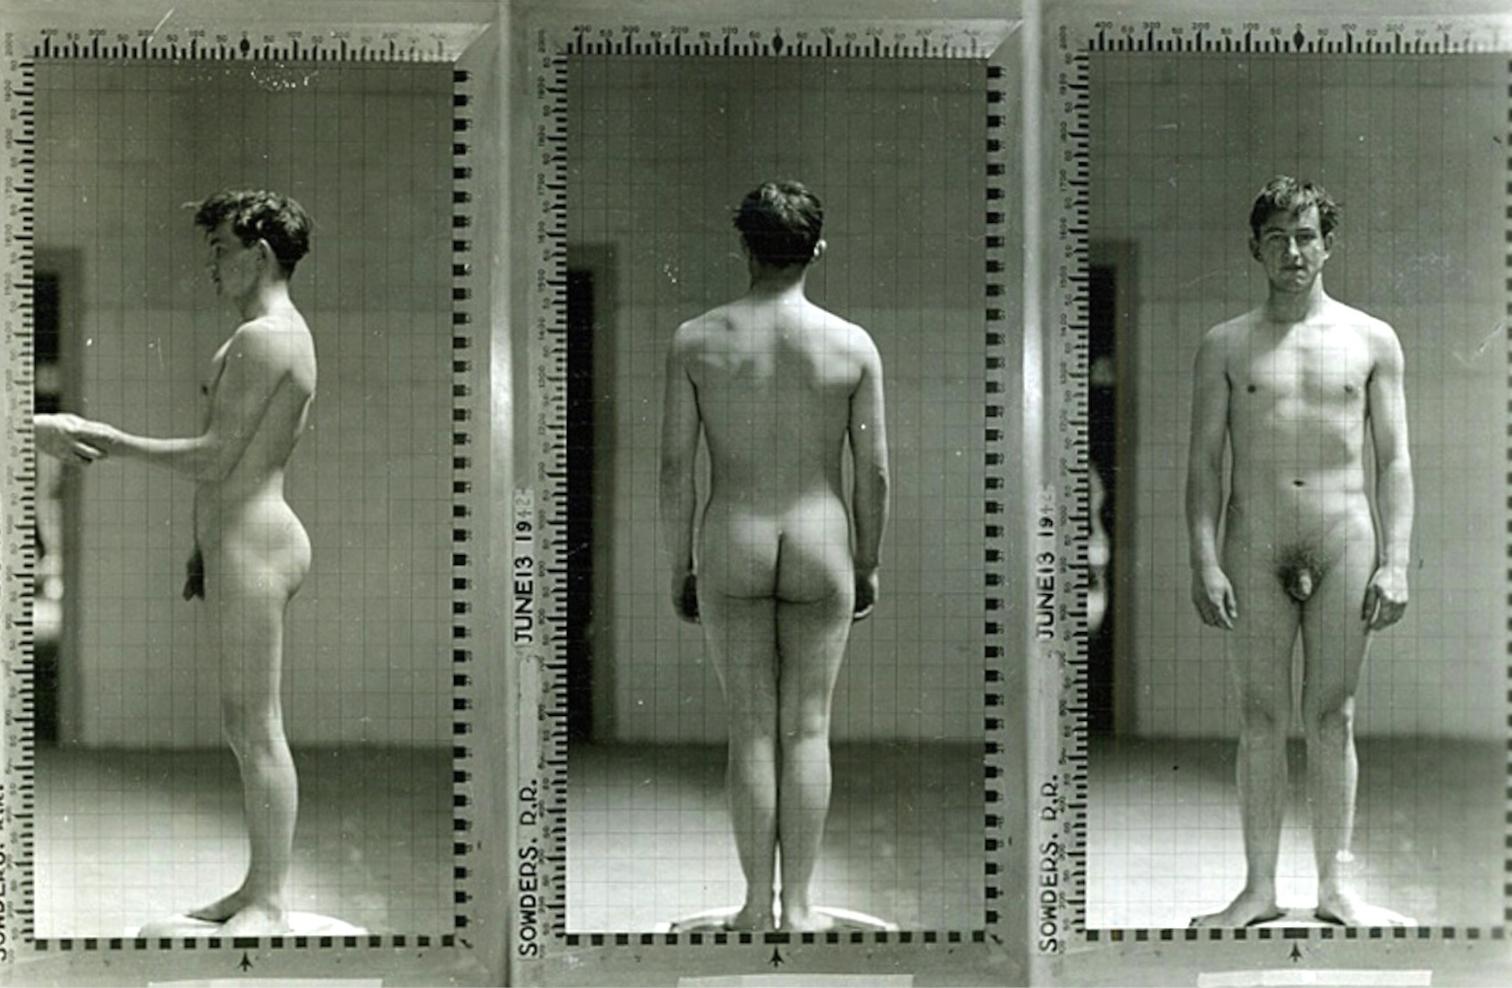 Ivy League Nude Posture Photos 58